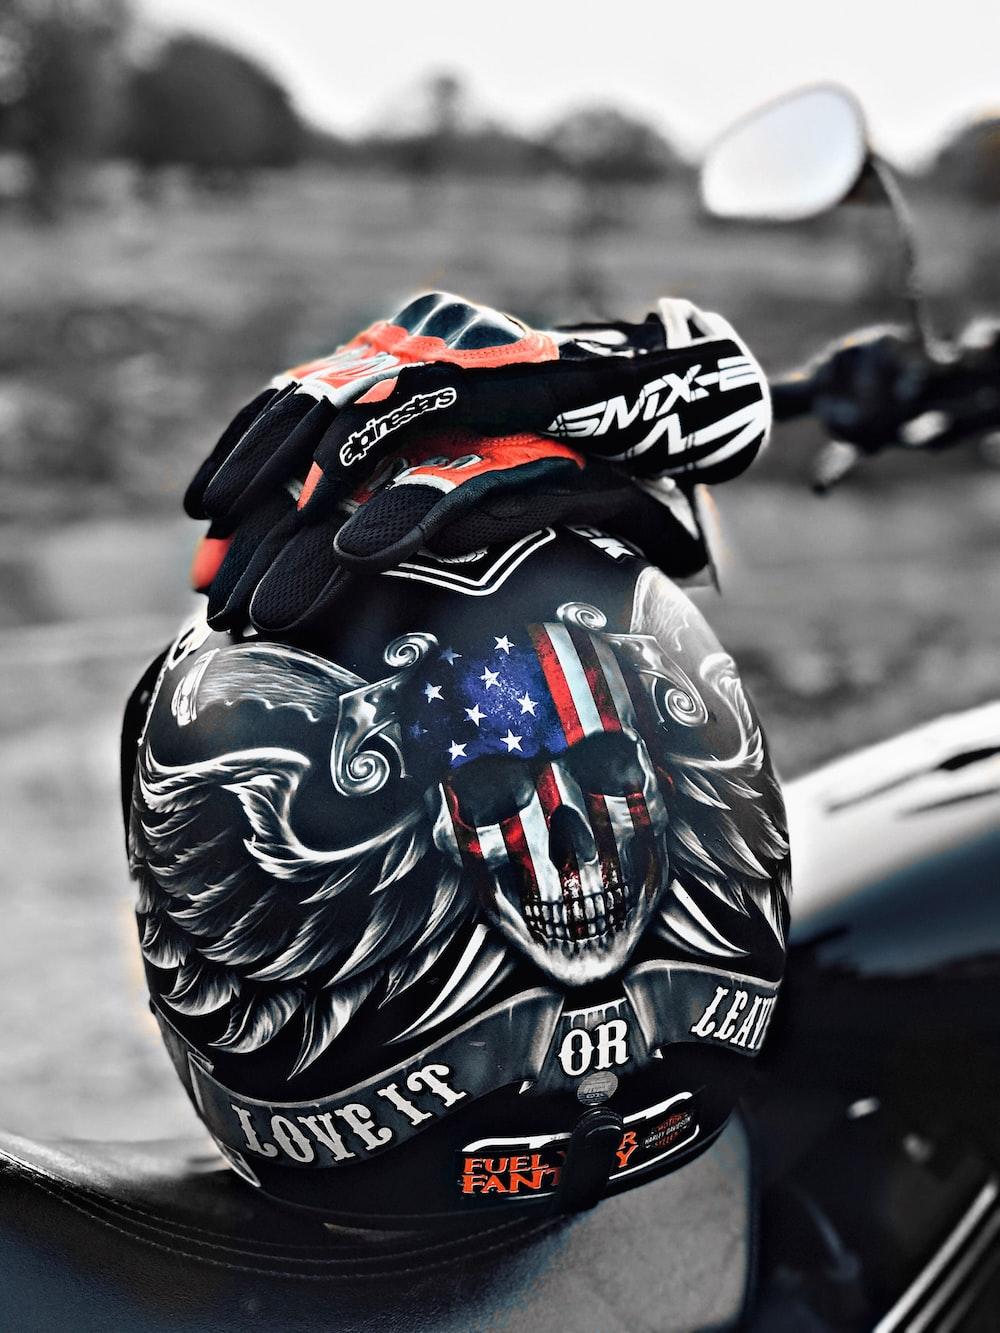 gloves on helmet on motorcycle